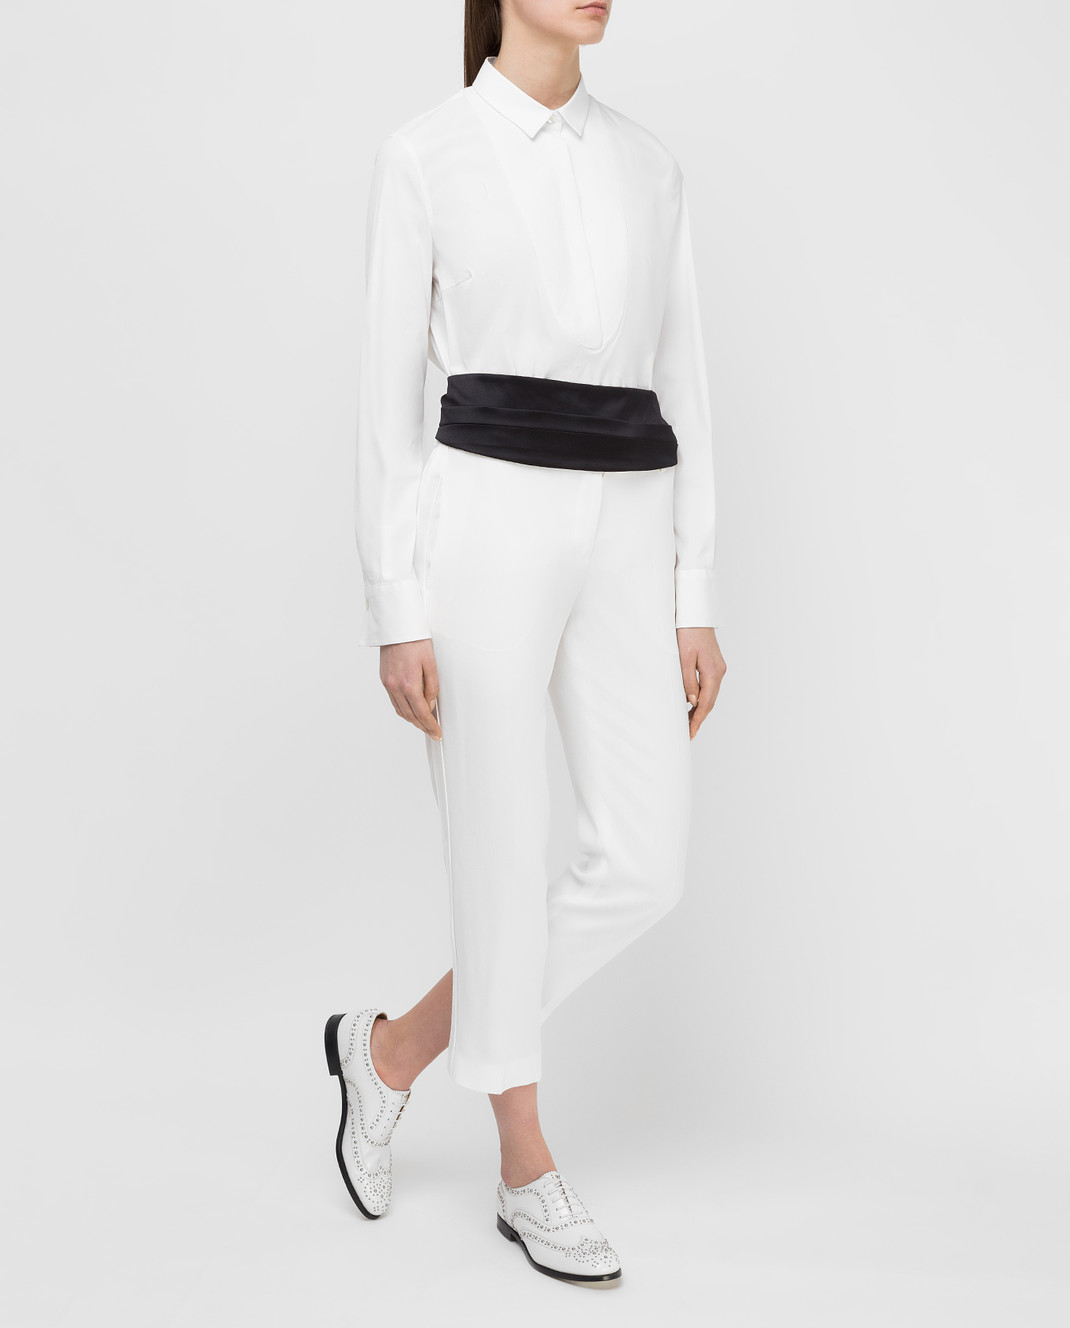 Brunello Cucinelli Белая рубашка M0091M6215 изображение 2